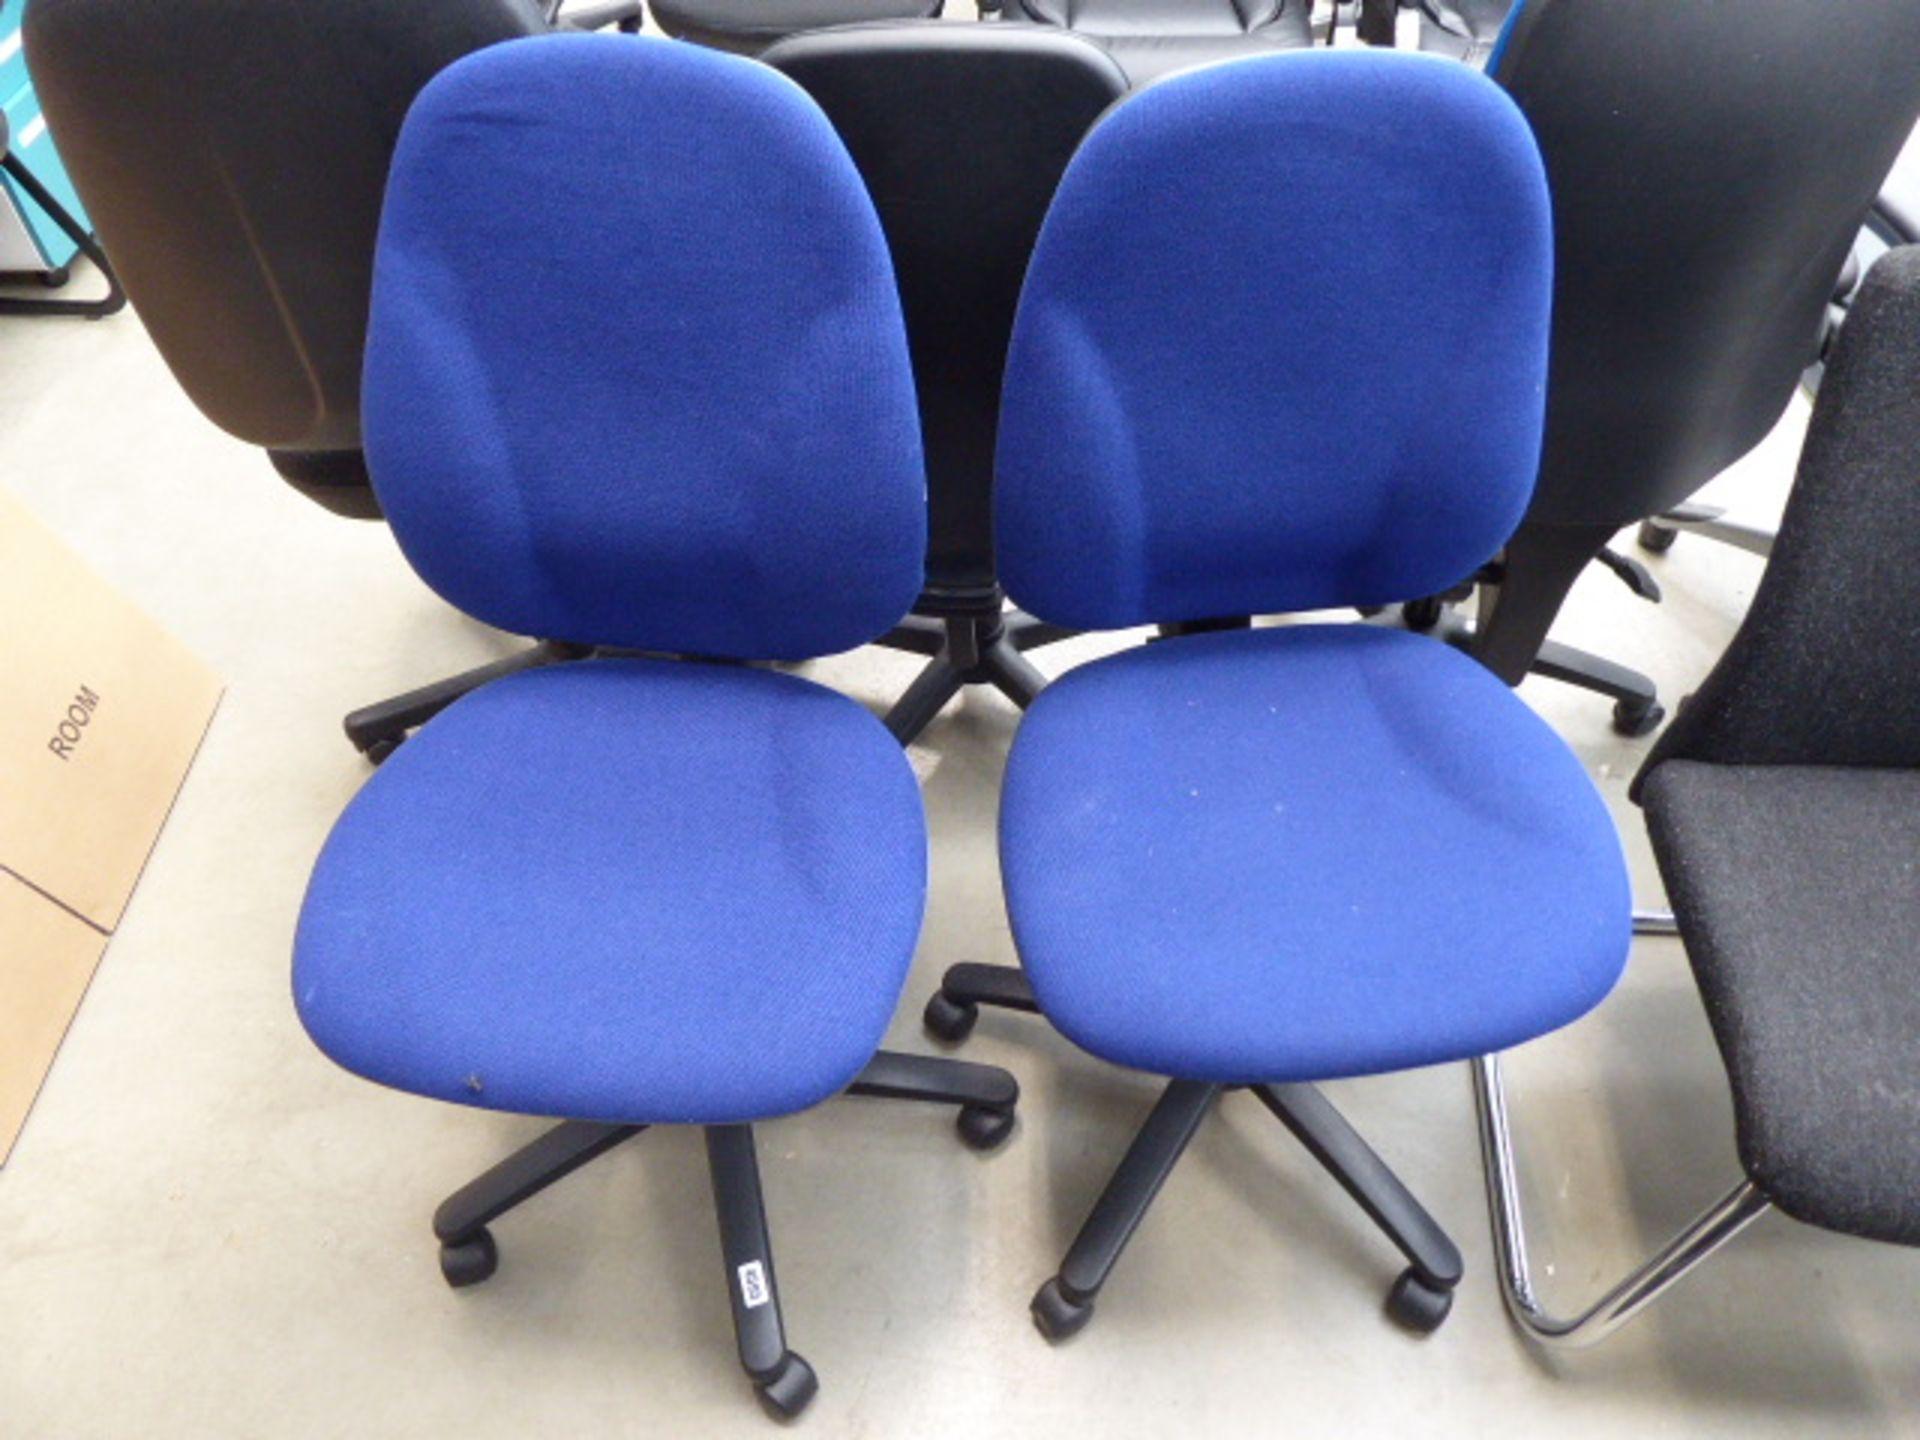 Lot 4595 - 2 blue cloth swivel chairs